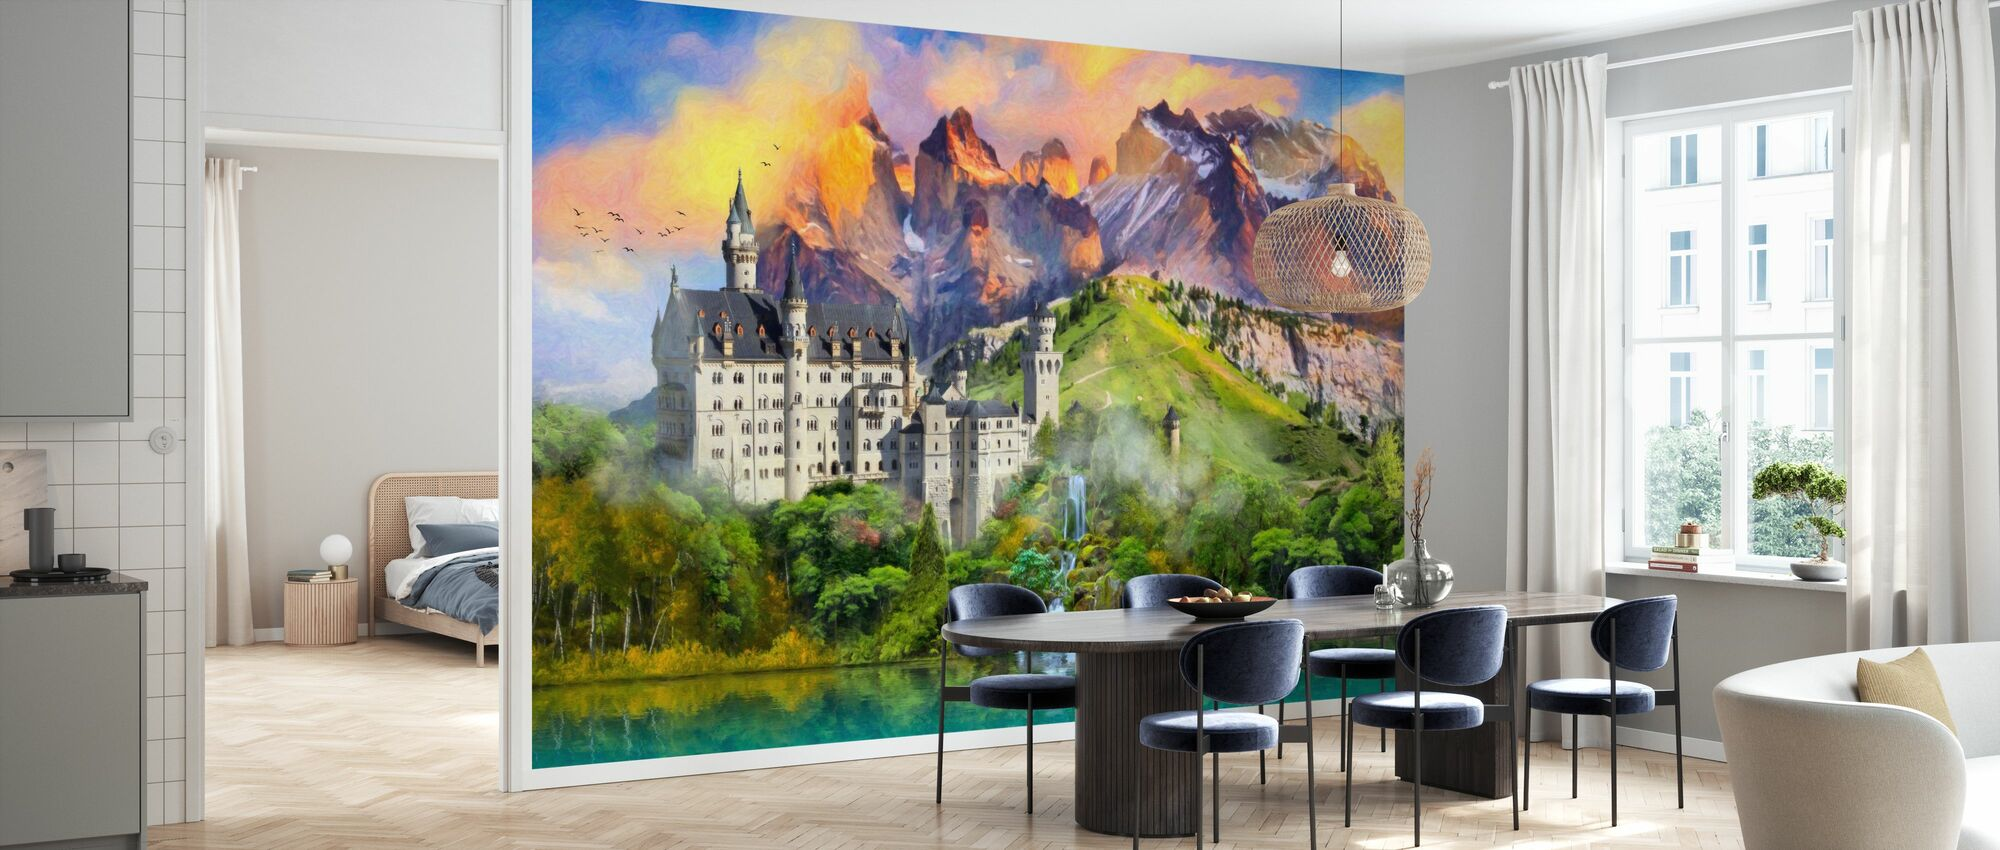 Castle Majesty - Wallpaper - Kitchen